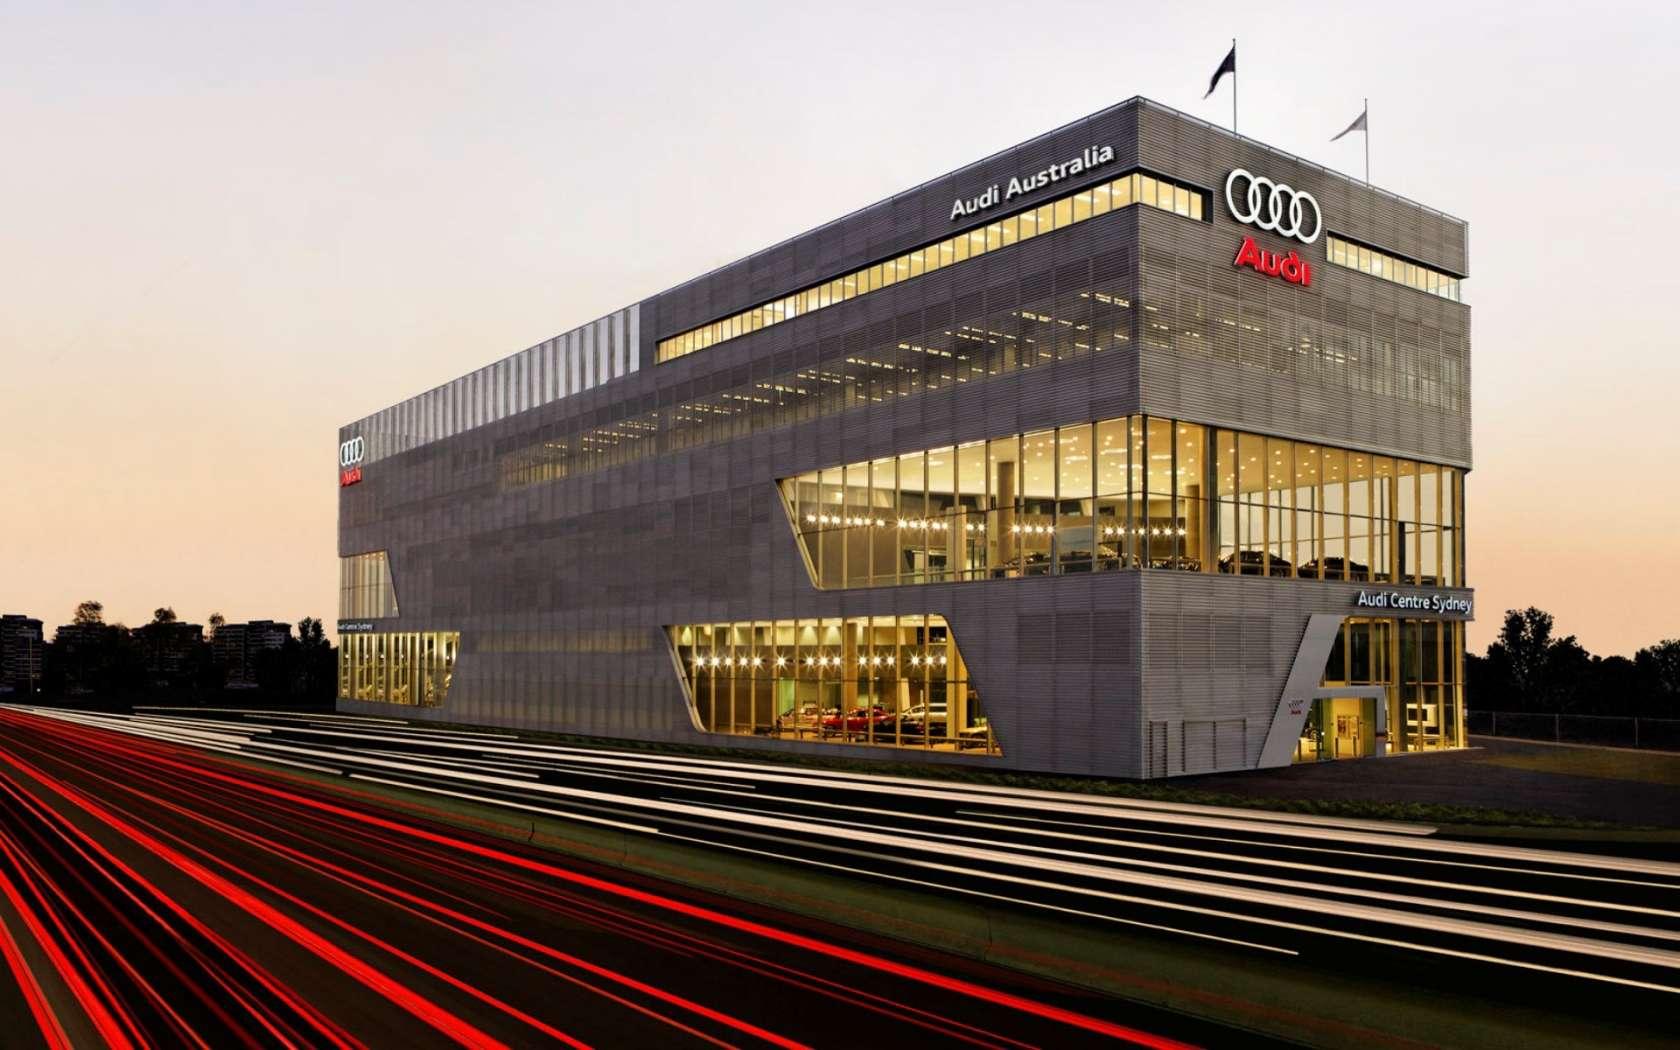 The Most Beautiful Car Dealerships Audi Lighthouse Terminal - Audi car dealers